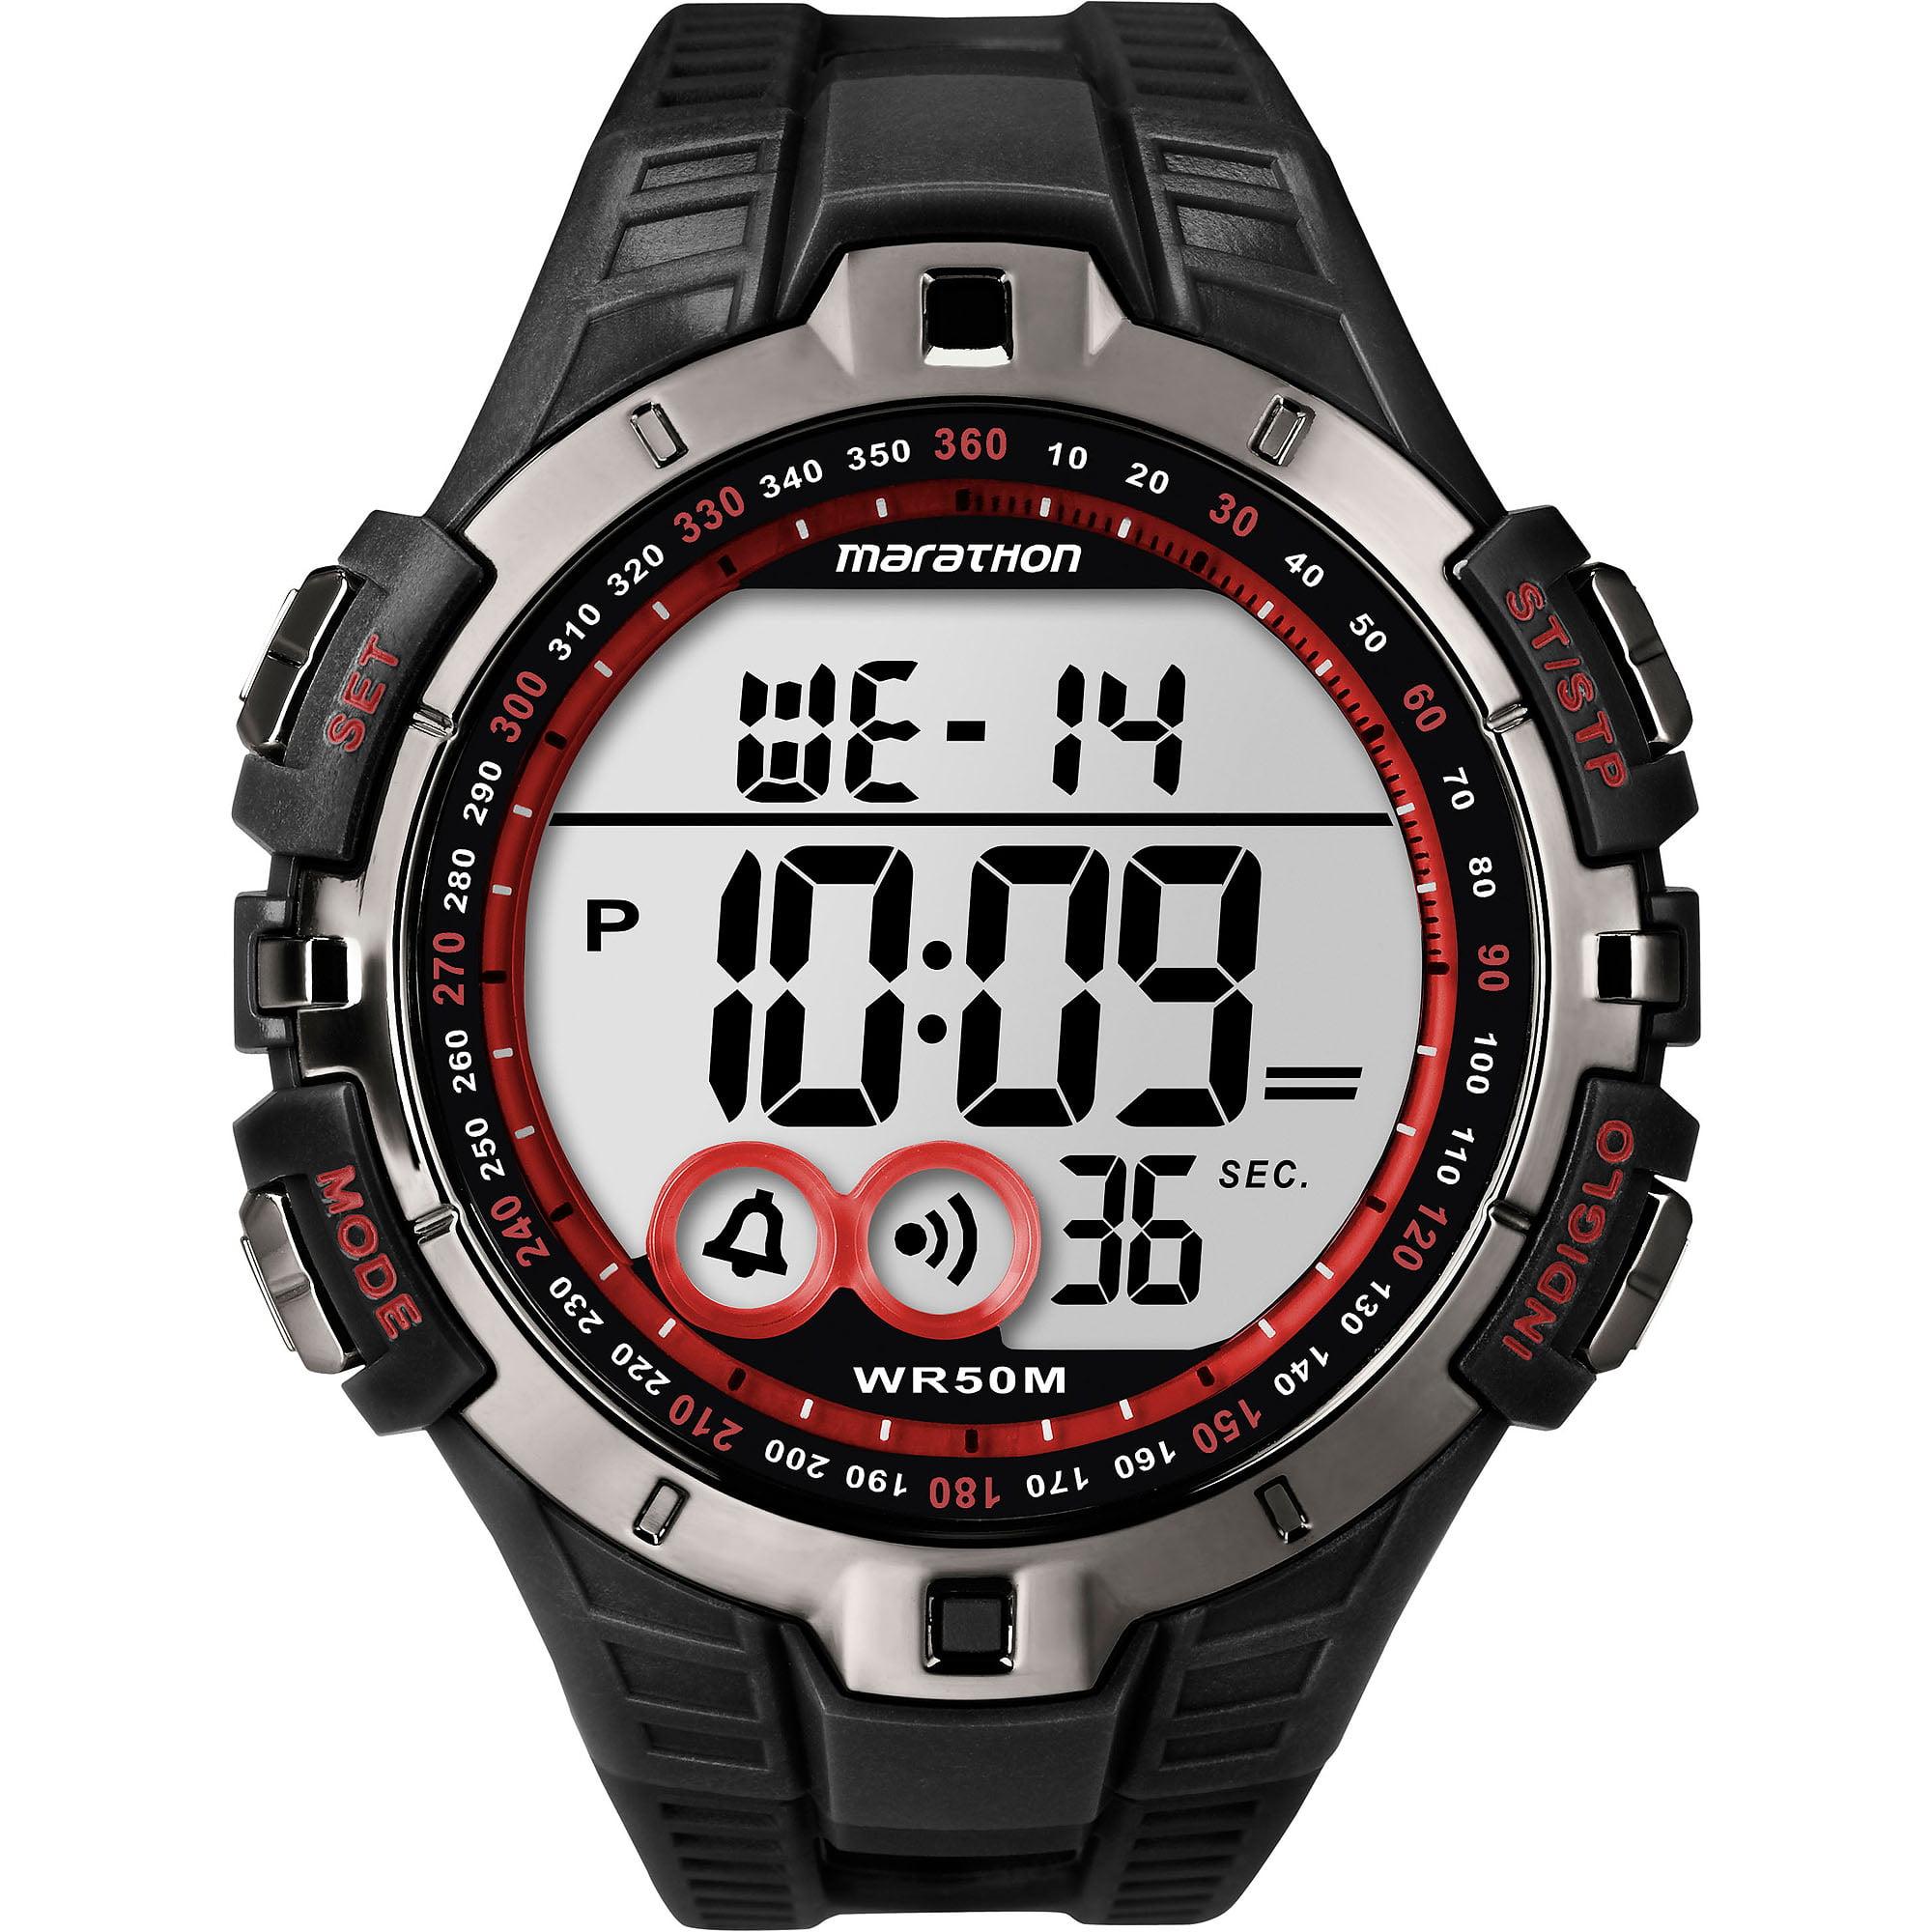 Marathon by Timex Men's Digital Full-Size Watch, Black Resin Strap